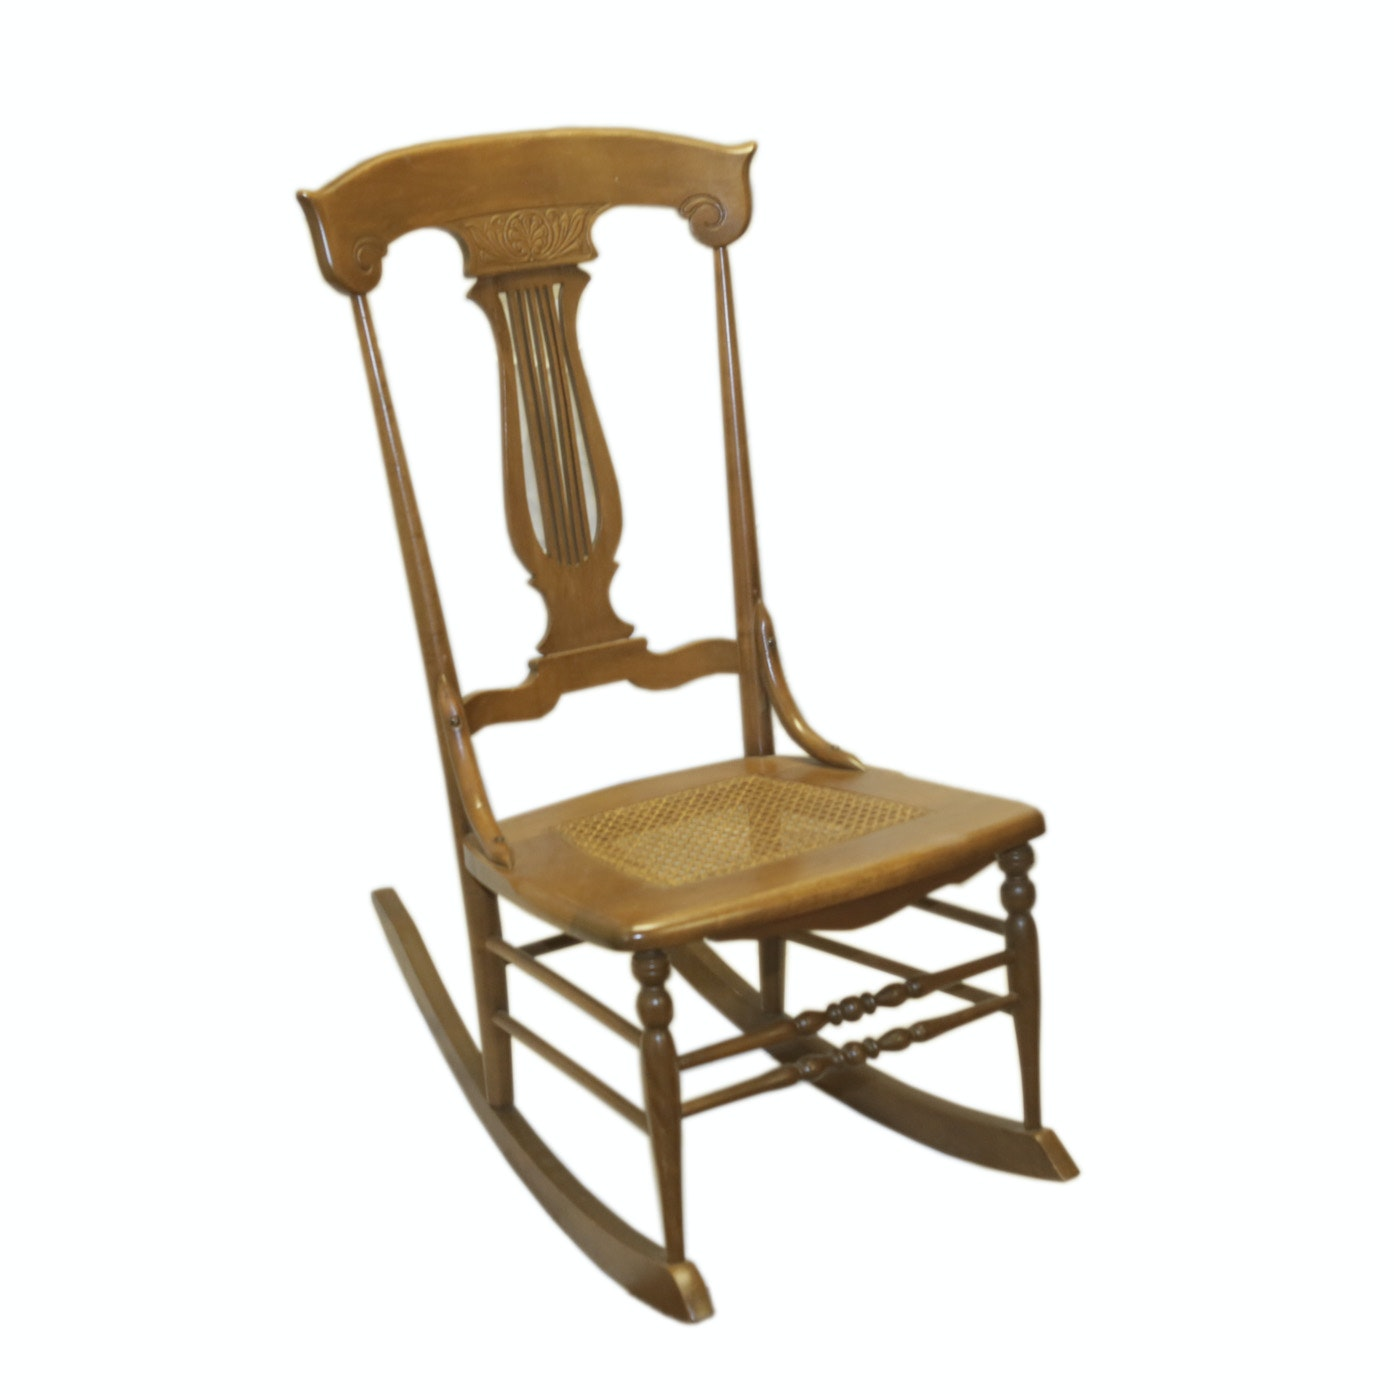 Cane Seat Rocking Chair